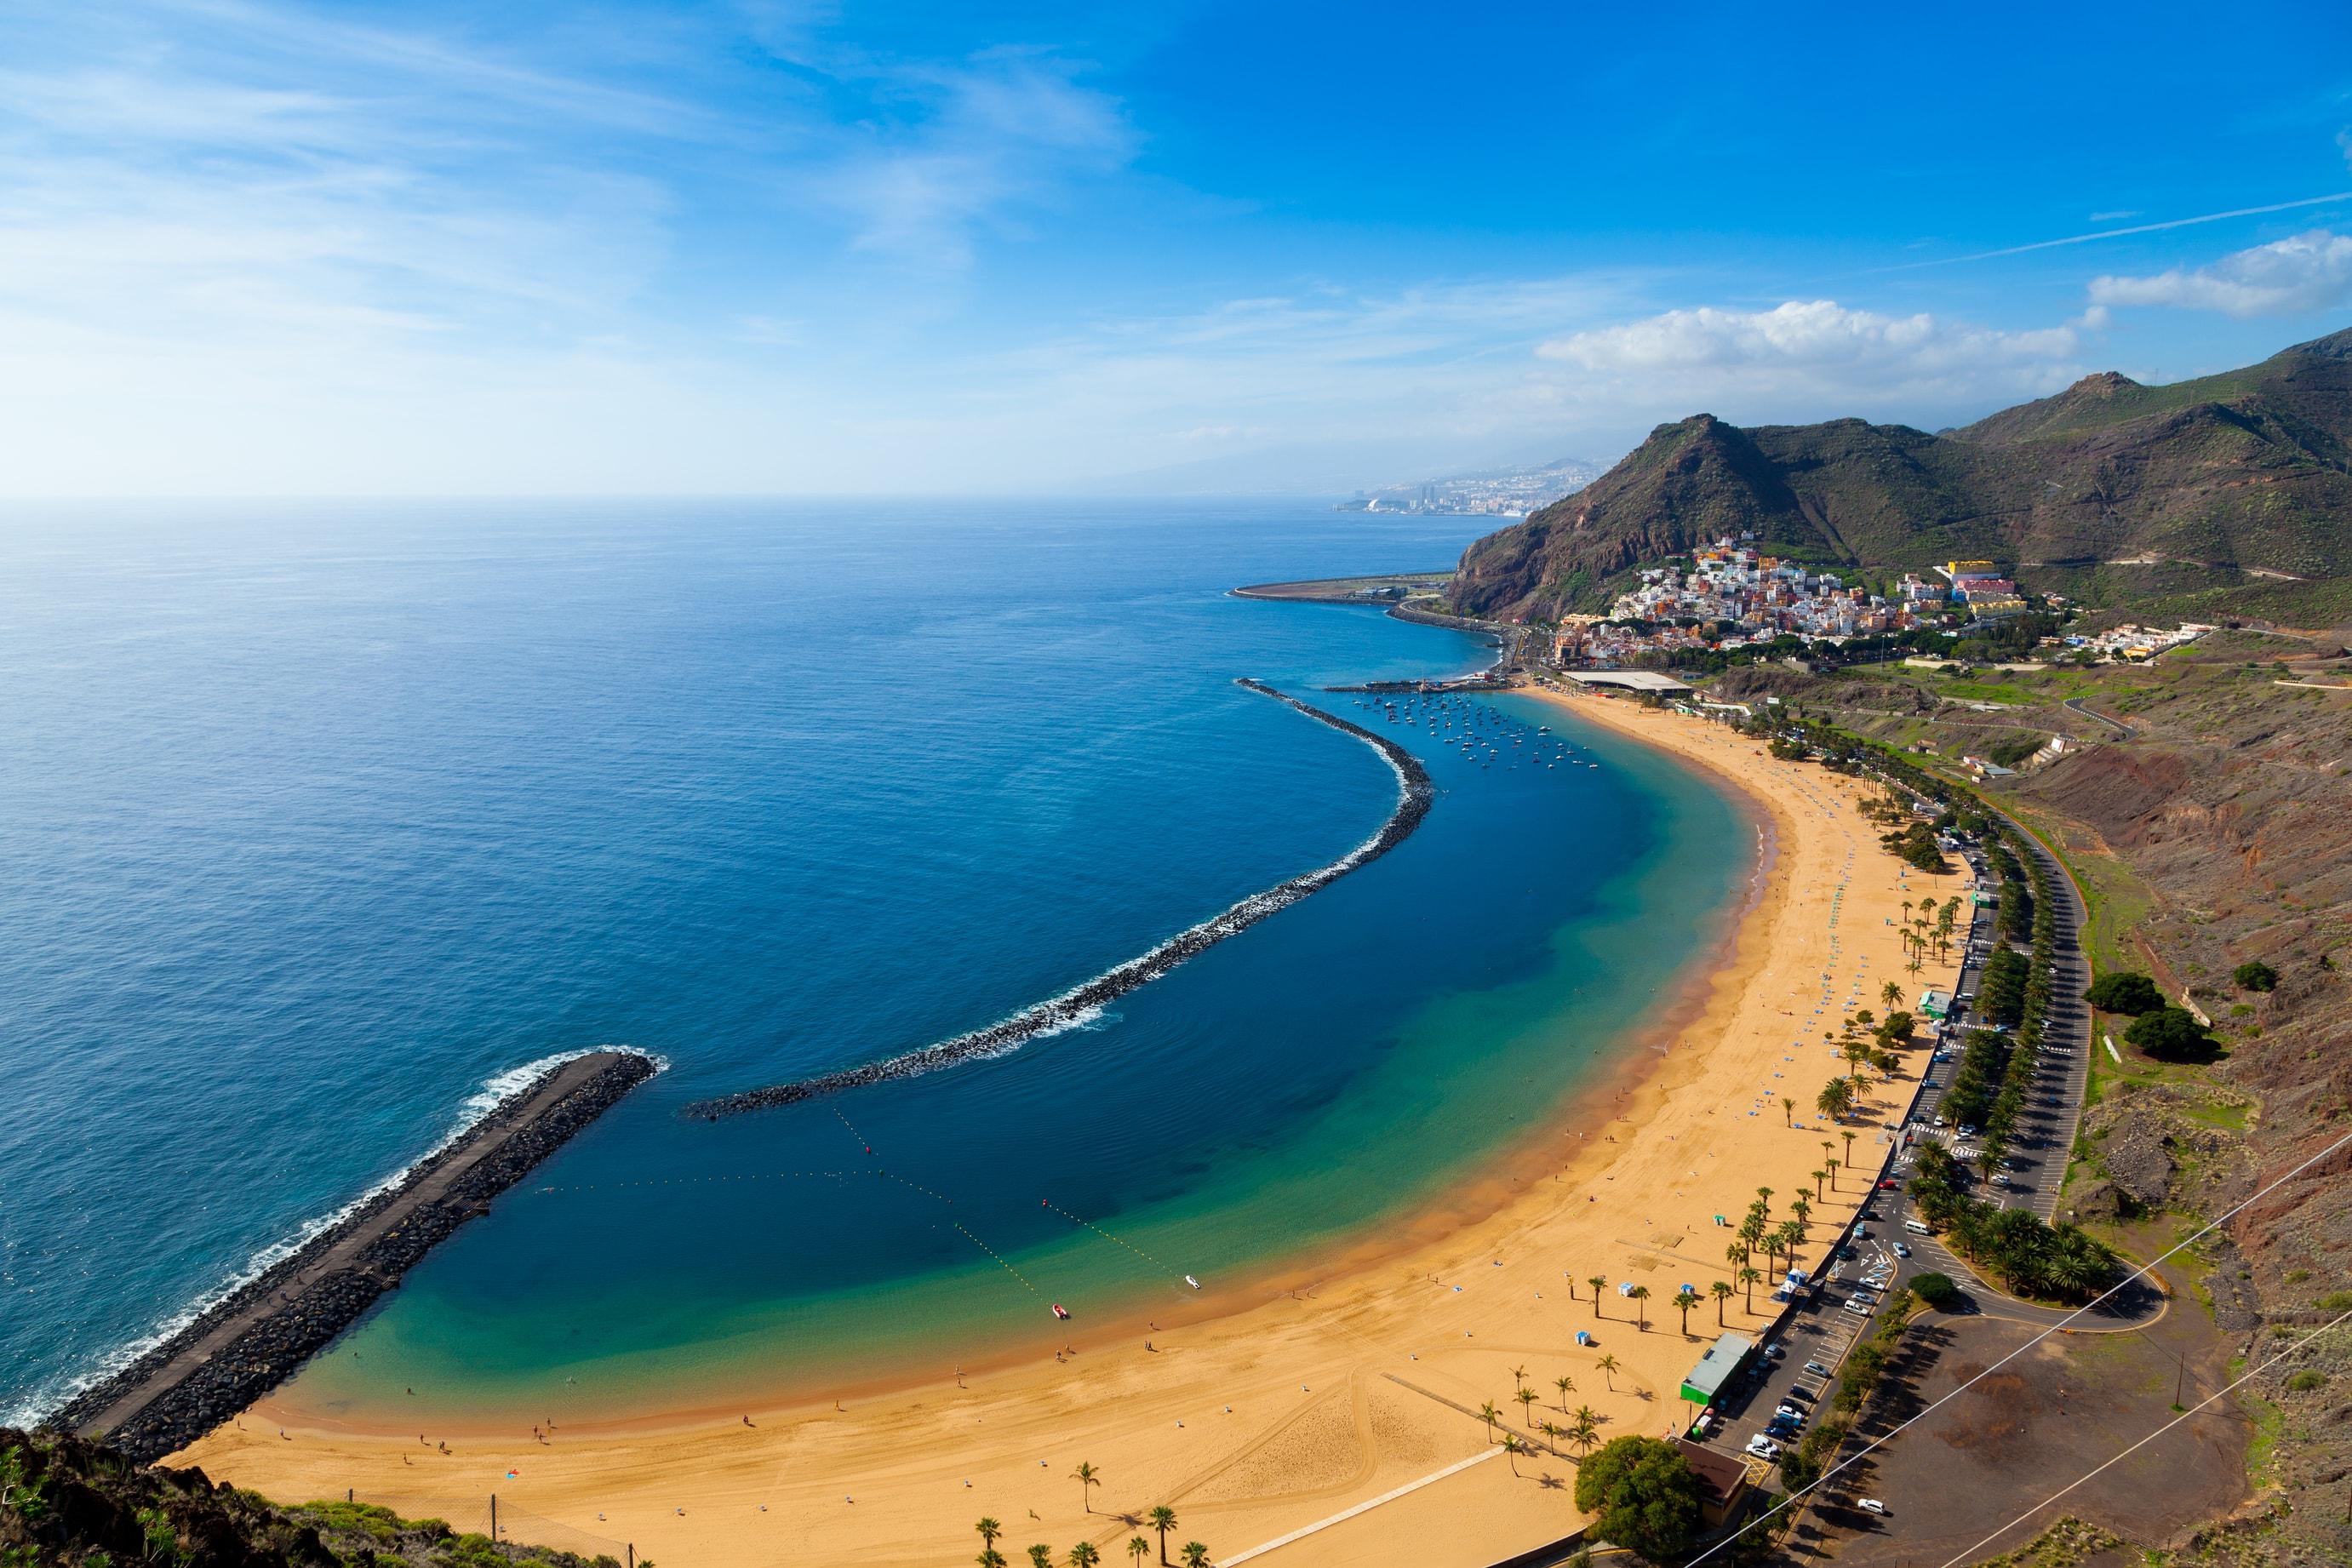 Vacanze al mare a Tenerife